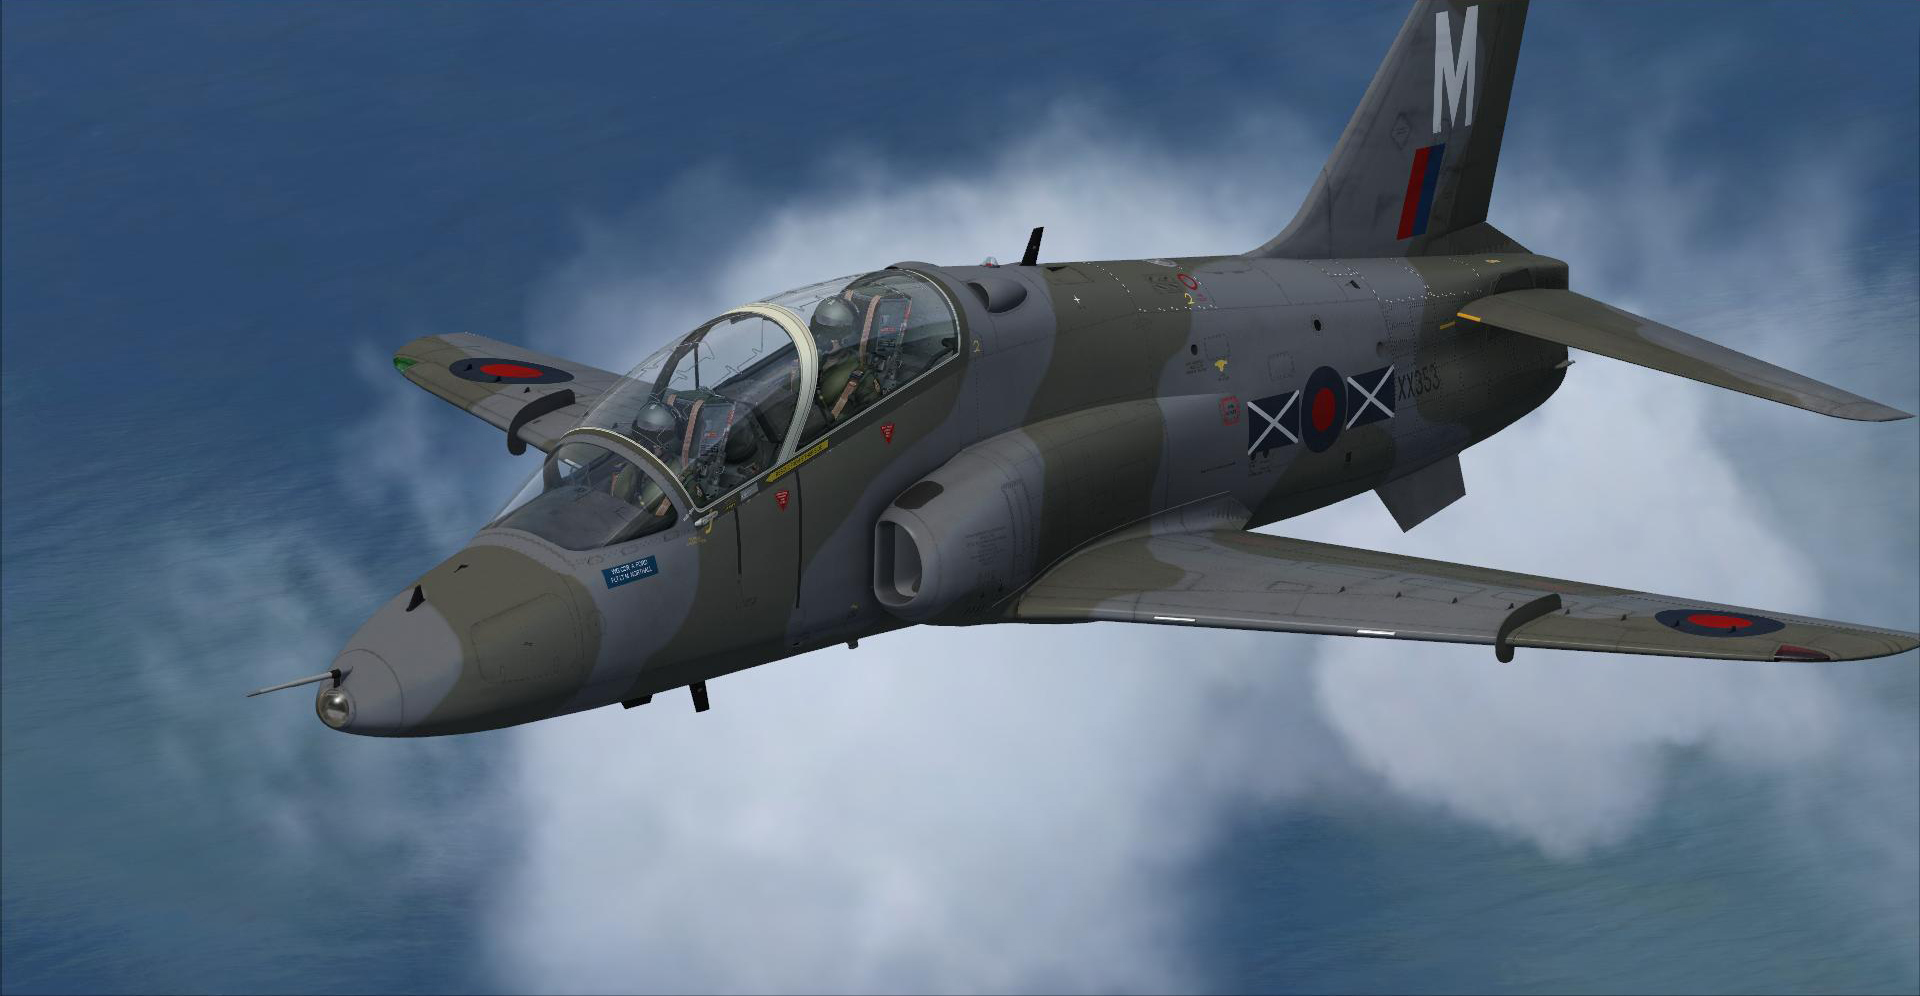 HawkT1A_RTM_7.jpg